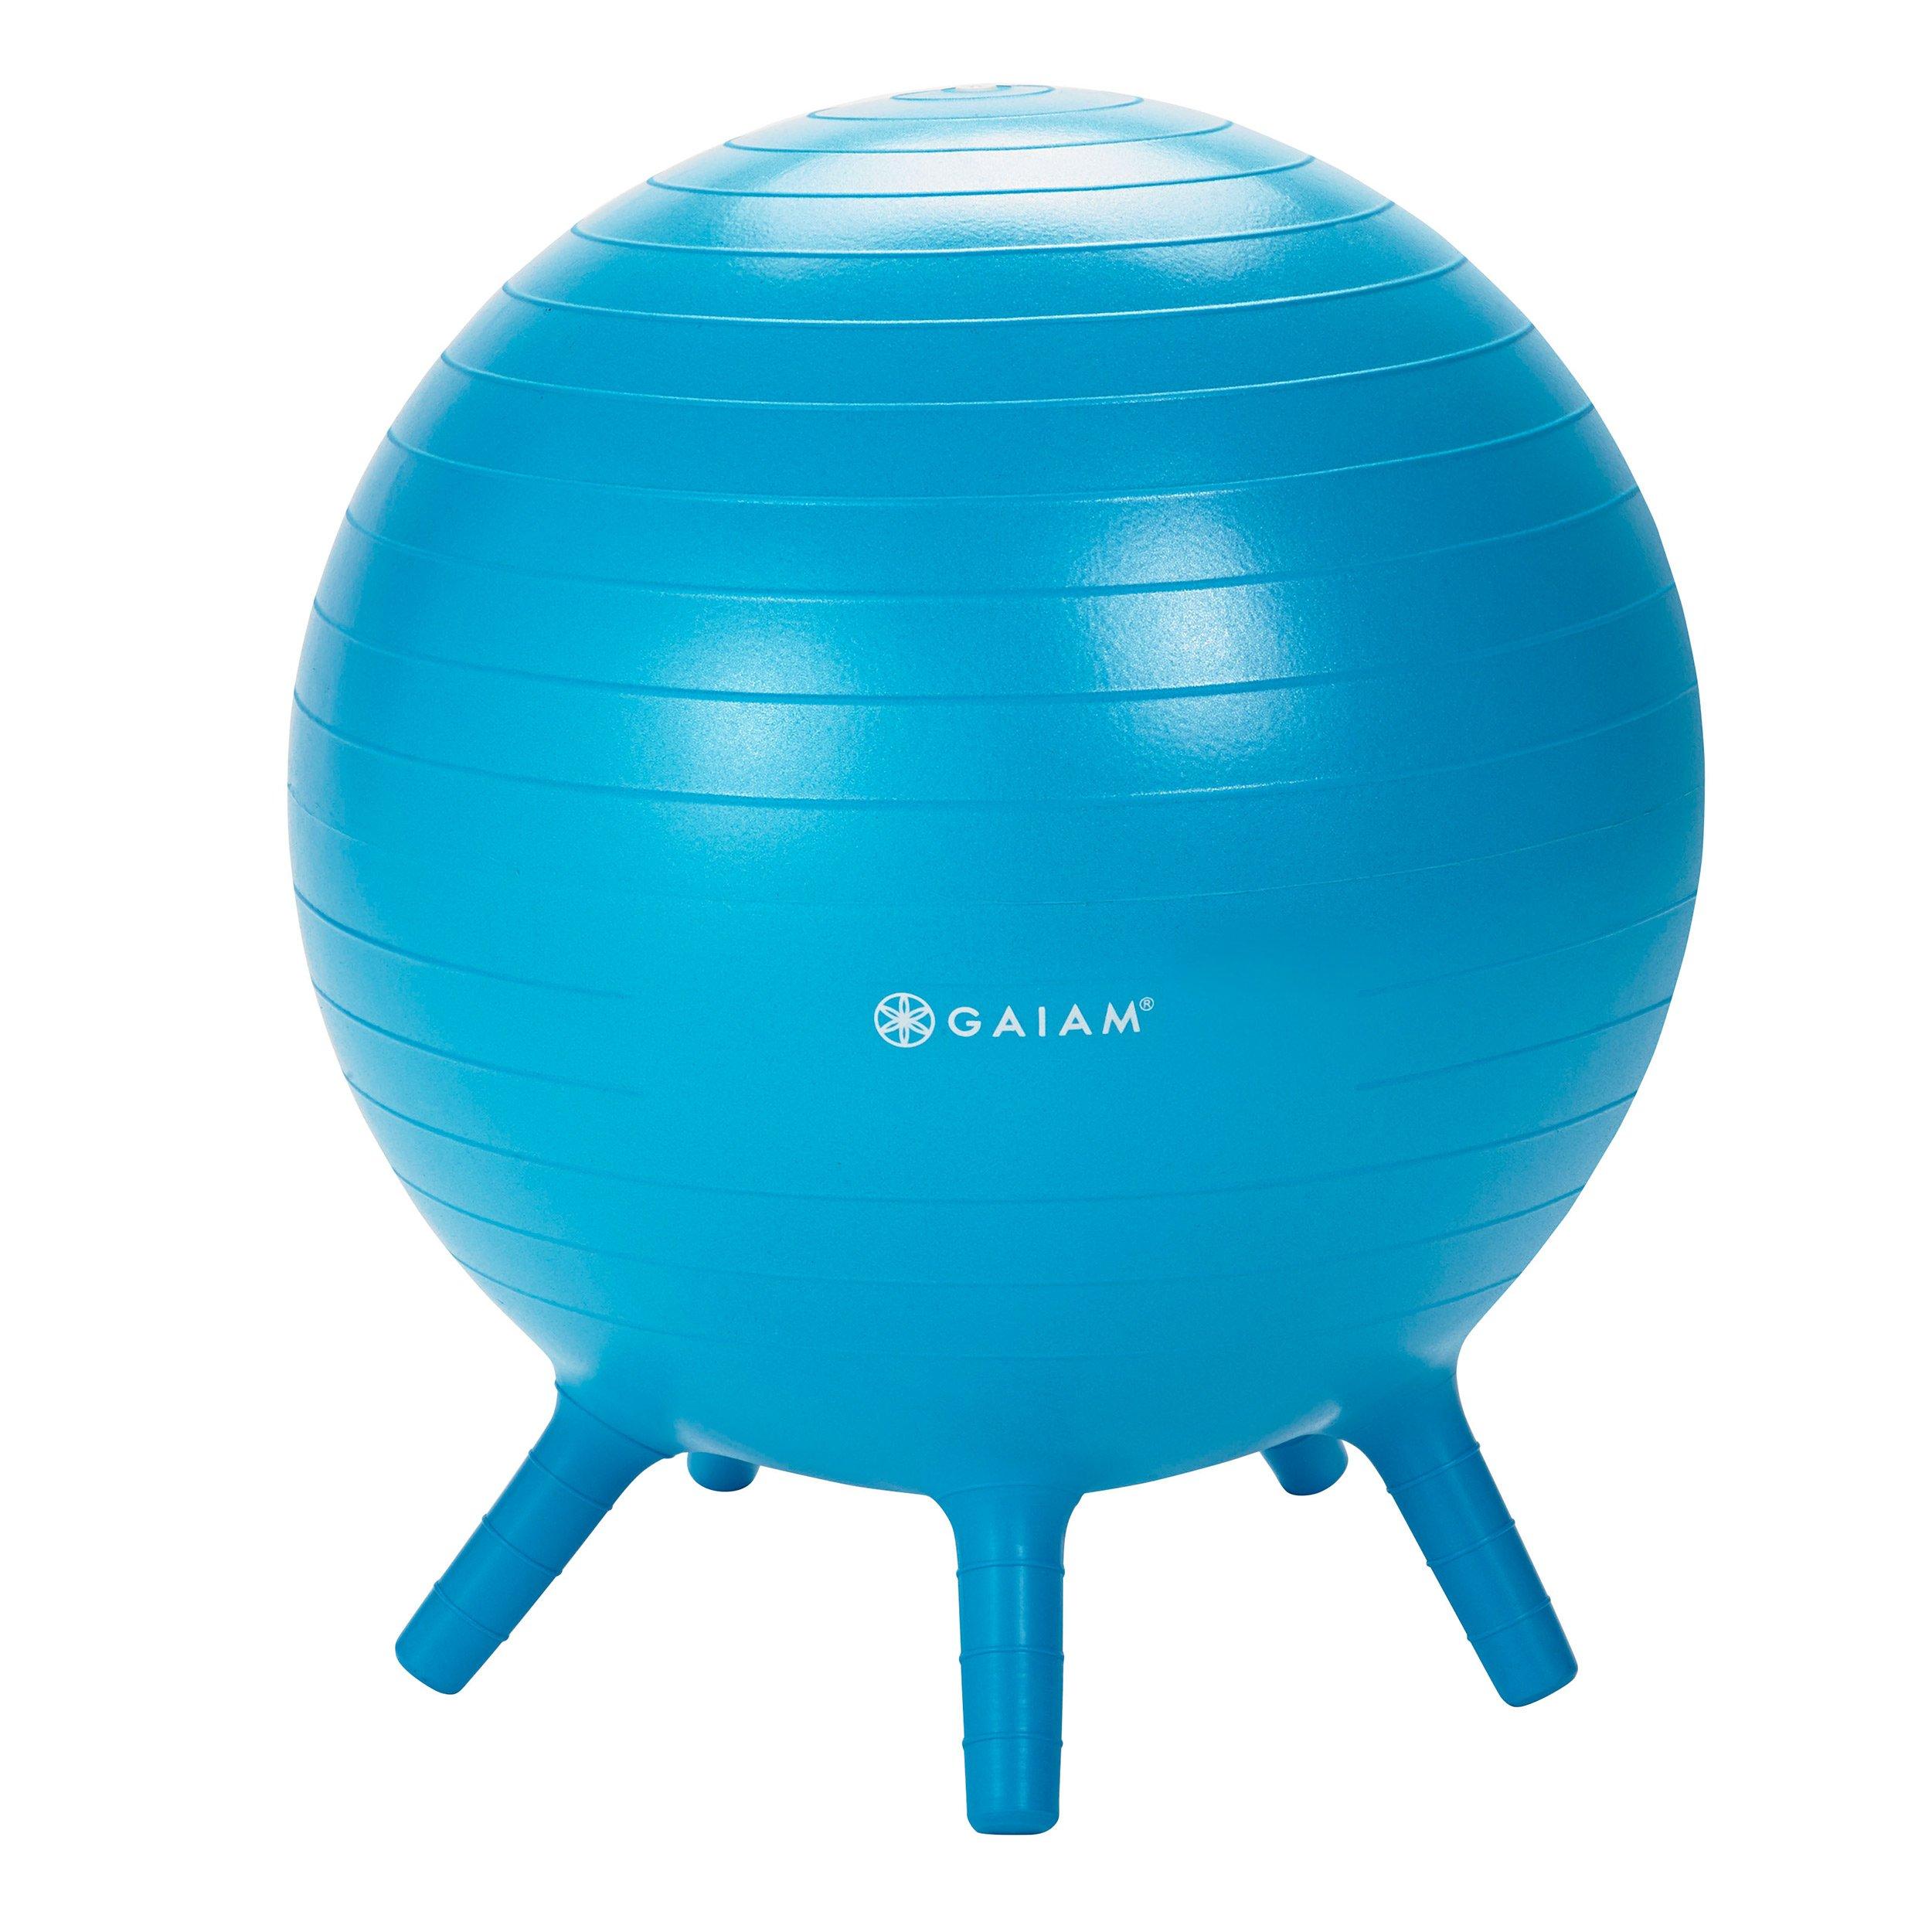 Stability Ball Office Chair Size: Amazon.com: Balance Ball Chair